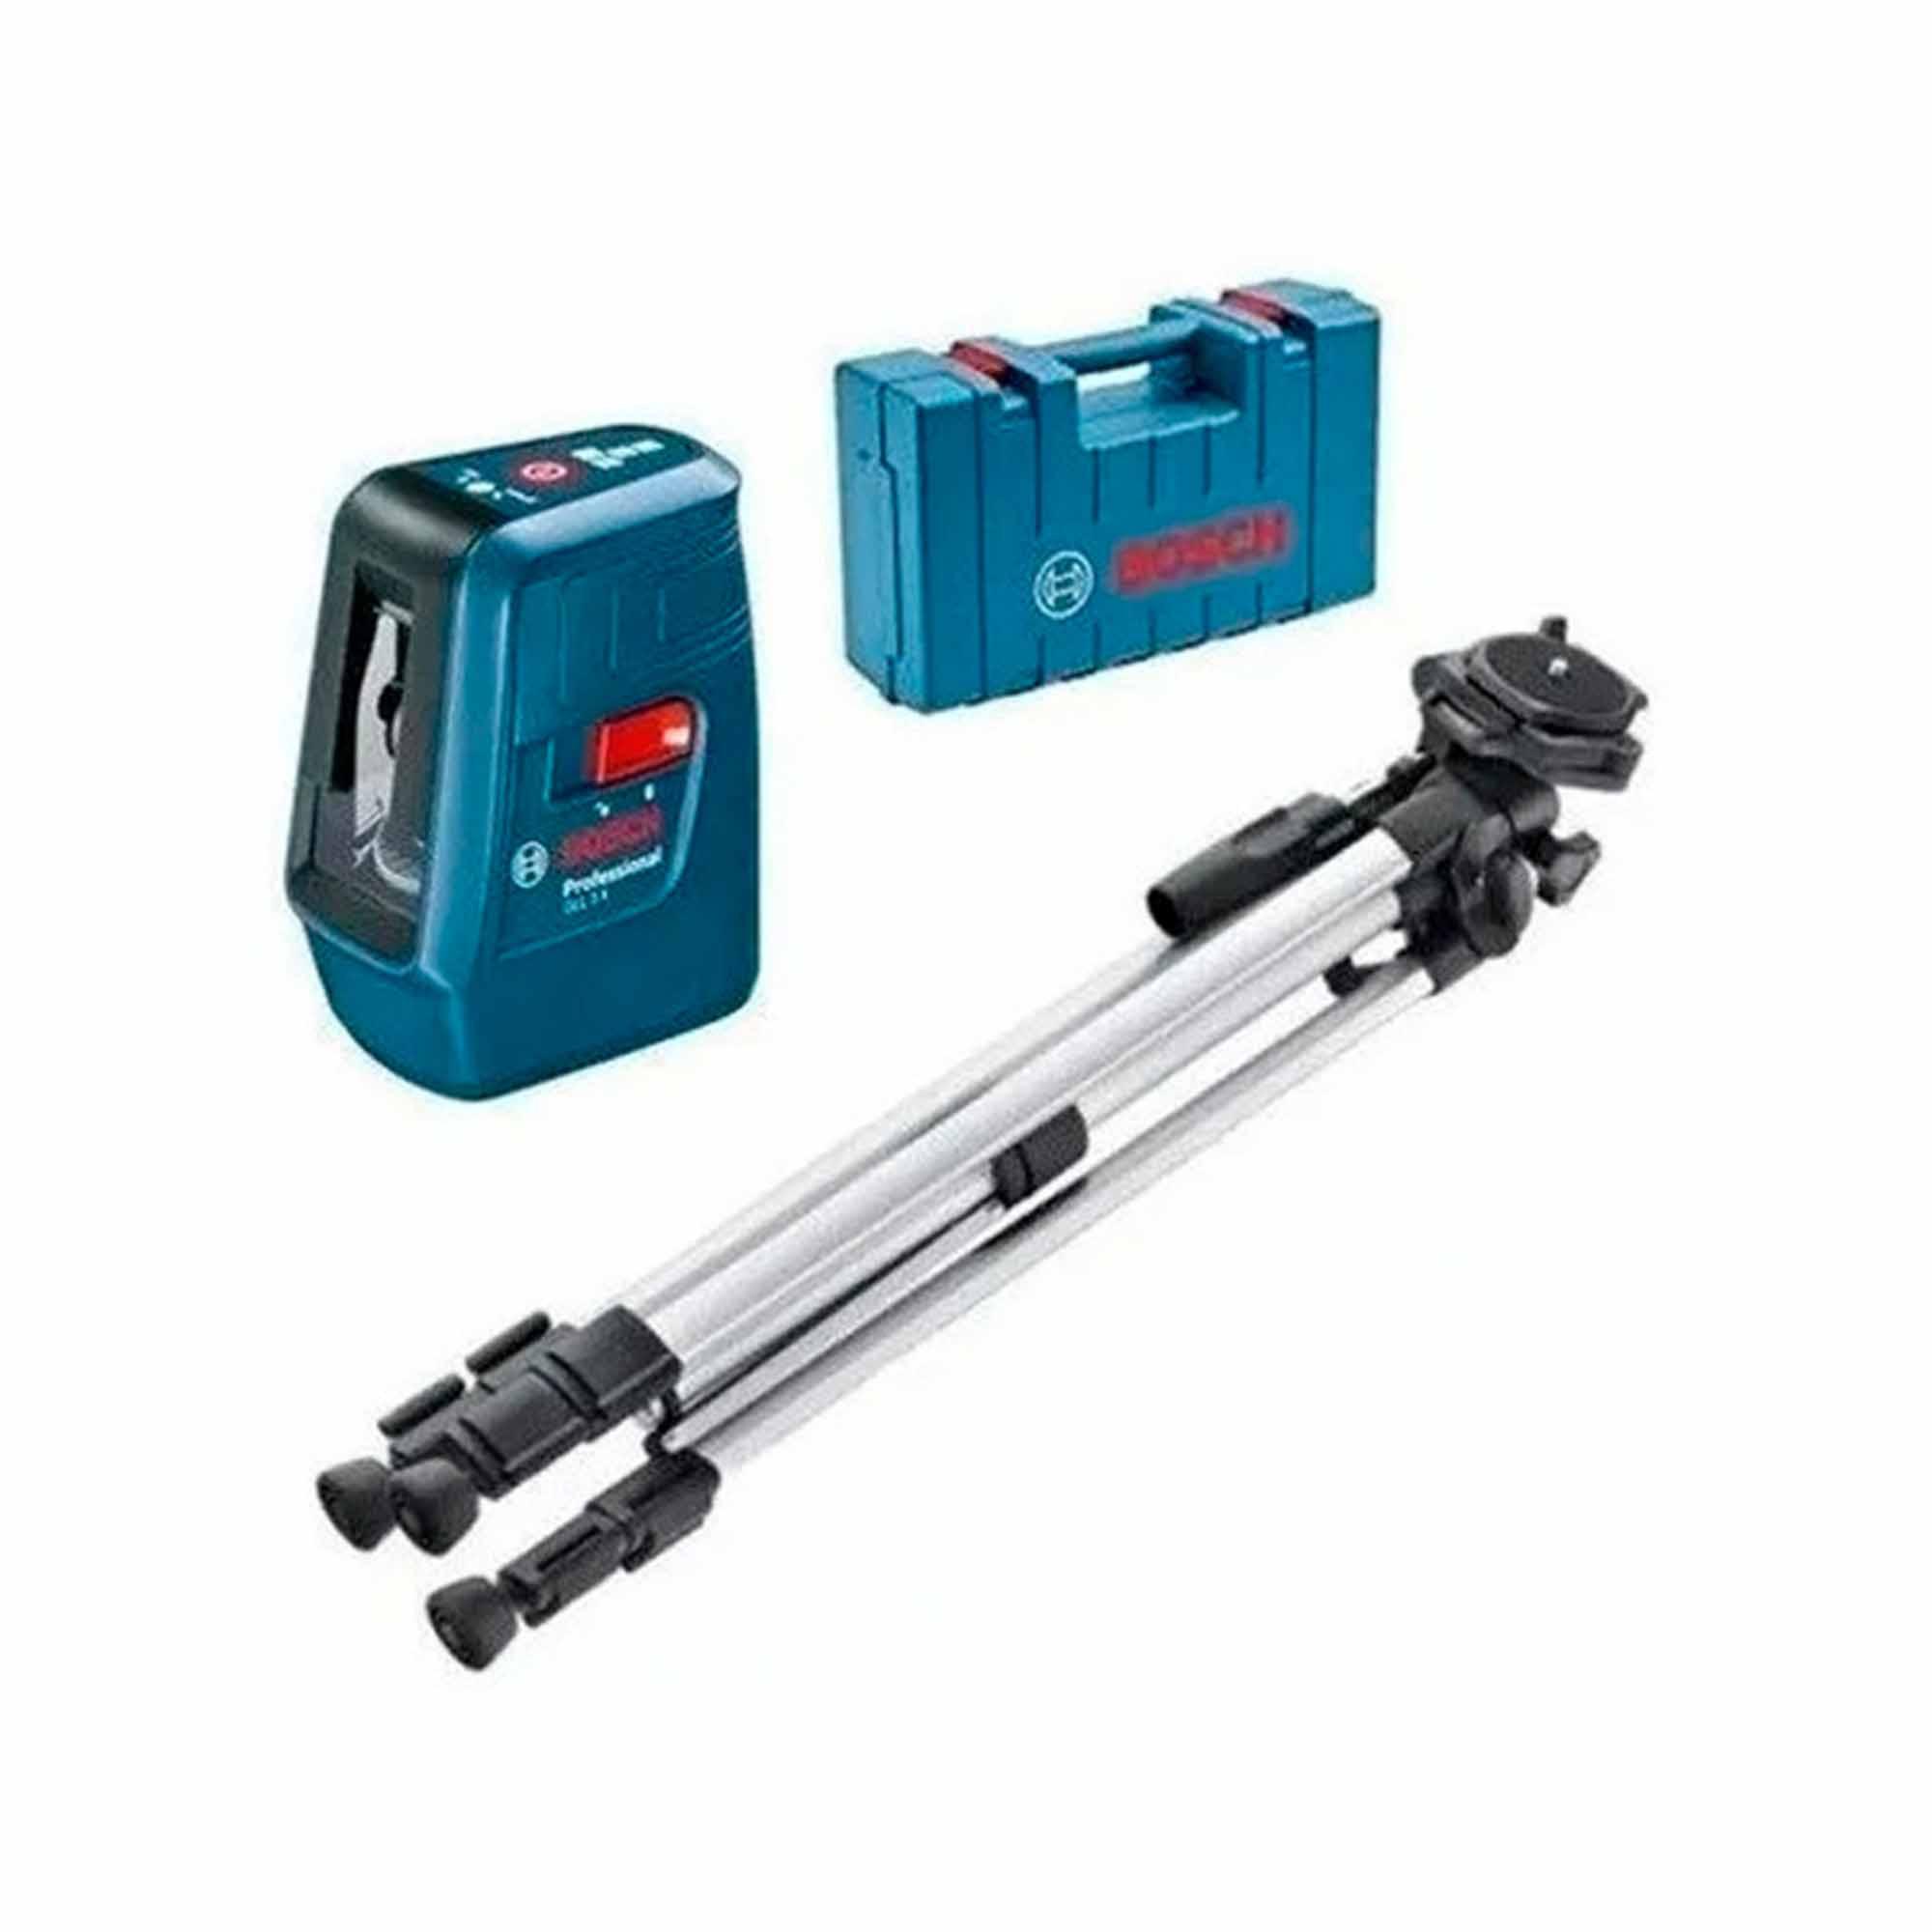 Nivel a Laser De Linha com Tripe Nivelox Gll 3 X - Bosch